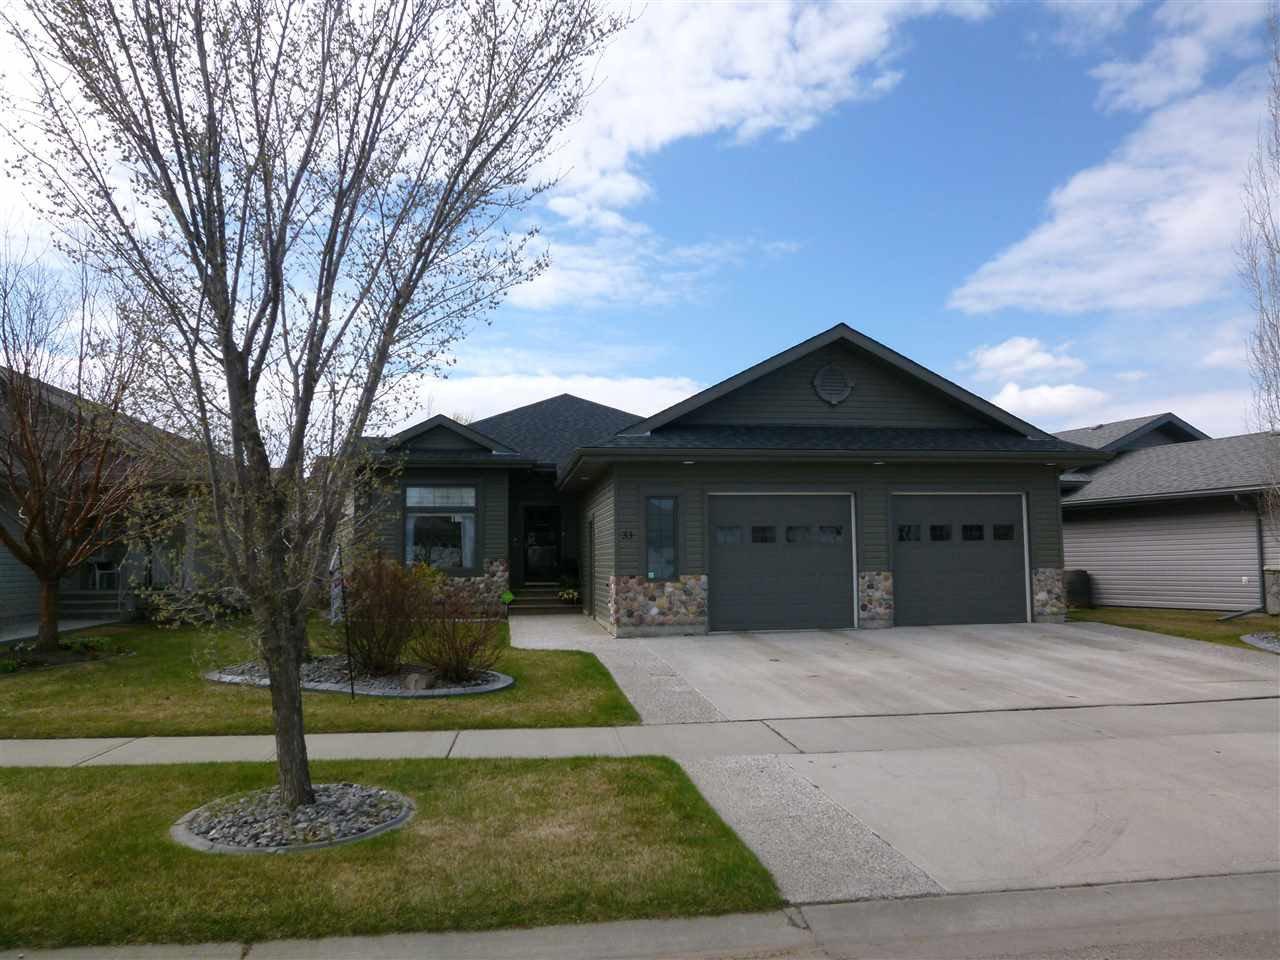 Main Photo: 33 WILLOW BROOK Point: Stony Plain House for sale : MLS®# E4193080